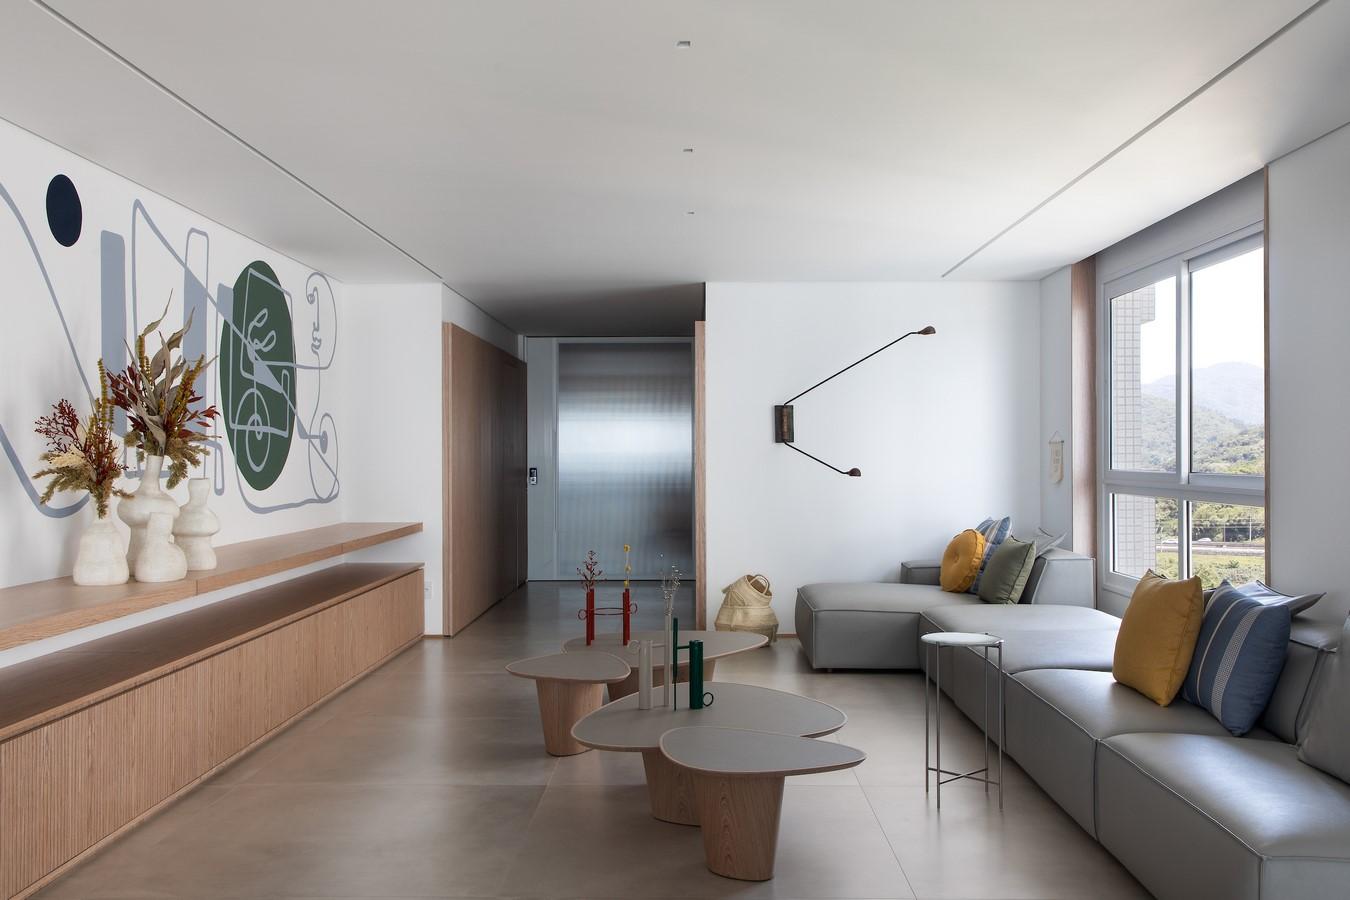 Apartamento Maresia by TN ARQUITETURA - Sheet1